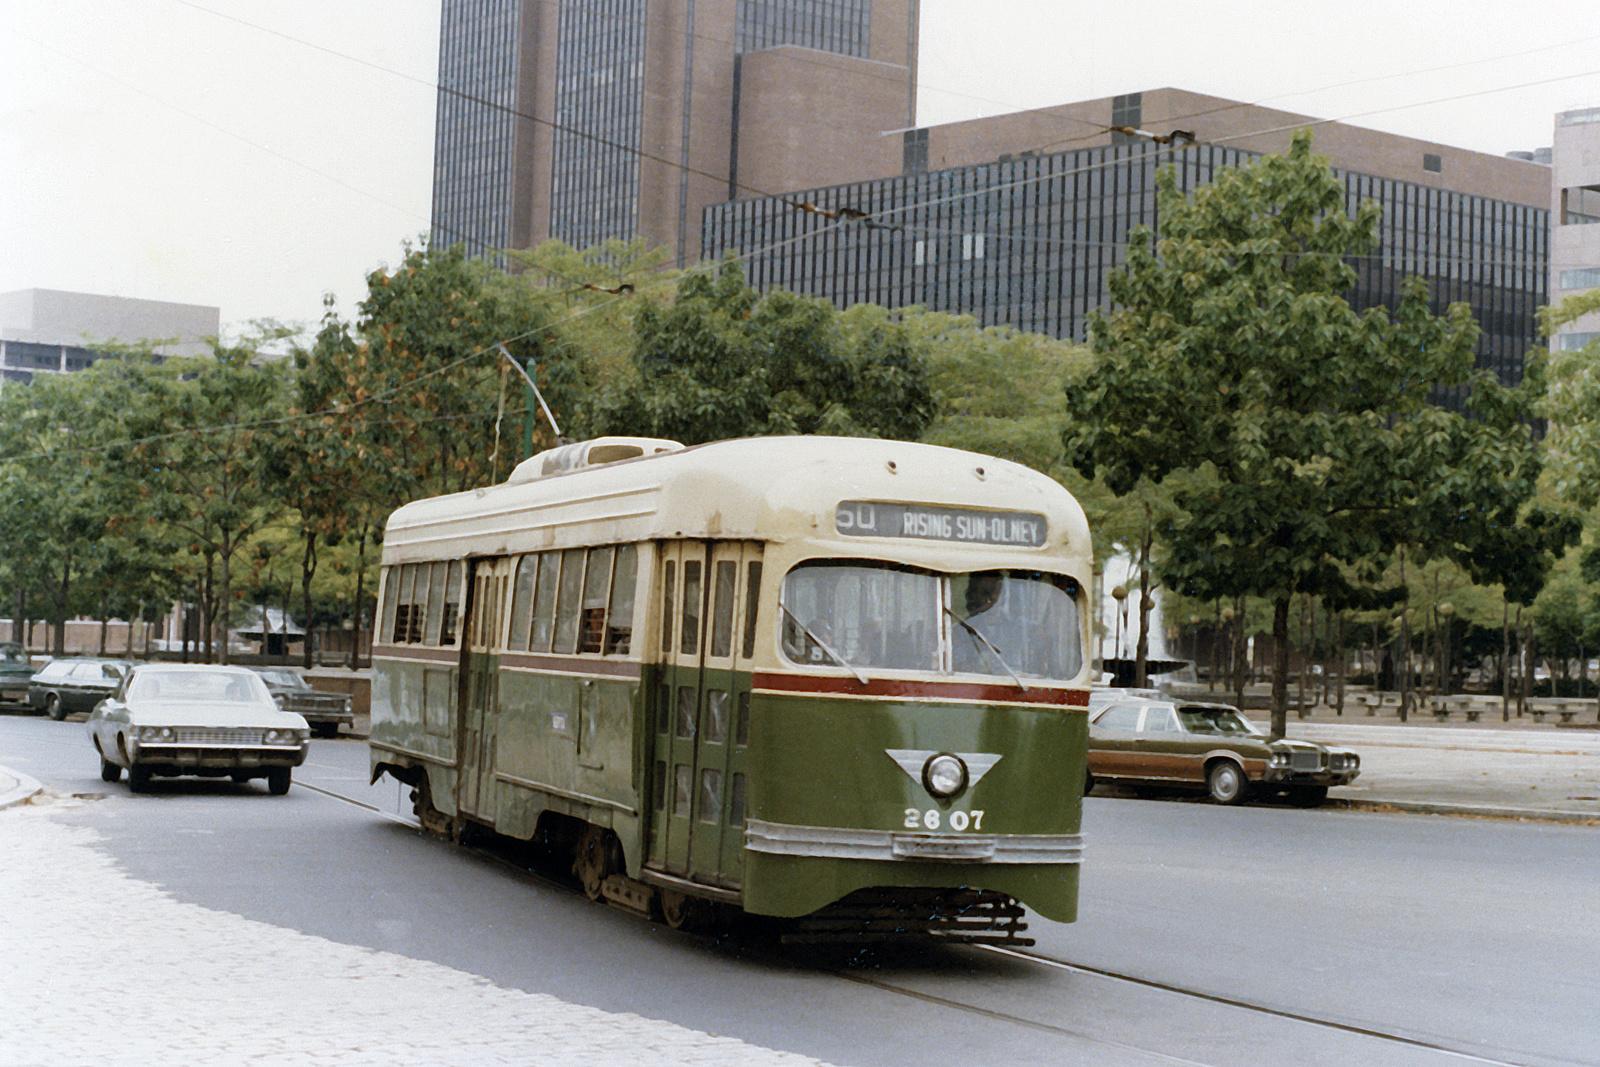 (904k, 1600x1067)<br><b>Country:</b> United States<br><b>City:</b> Philadelphia, PA<br><b>System:</b> SEPTA (or Predecessor)<br><b>Line:</b> Rt. 50-Rising Sun<br><b>Location:</b> 5th/Arch<br><b>Car:</b> PTC/SEPTA Wartime Air-car PCC (St.Louis, 1942) 2607 <br><b>Photo by:</b> Ralph Curcio<br><b>Collection of:</b> David Pirmann<br><b>Date:</b> 9/7/1975<br><b>Viewed (this week/total):</b> 0 / 98